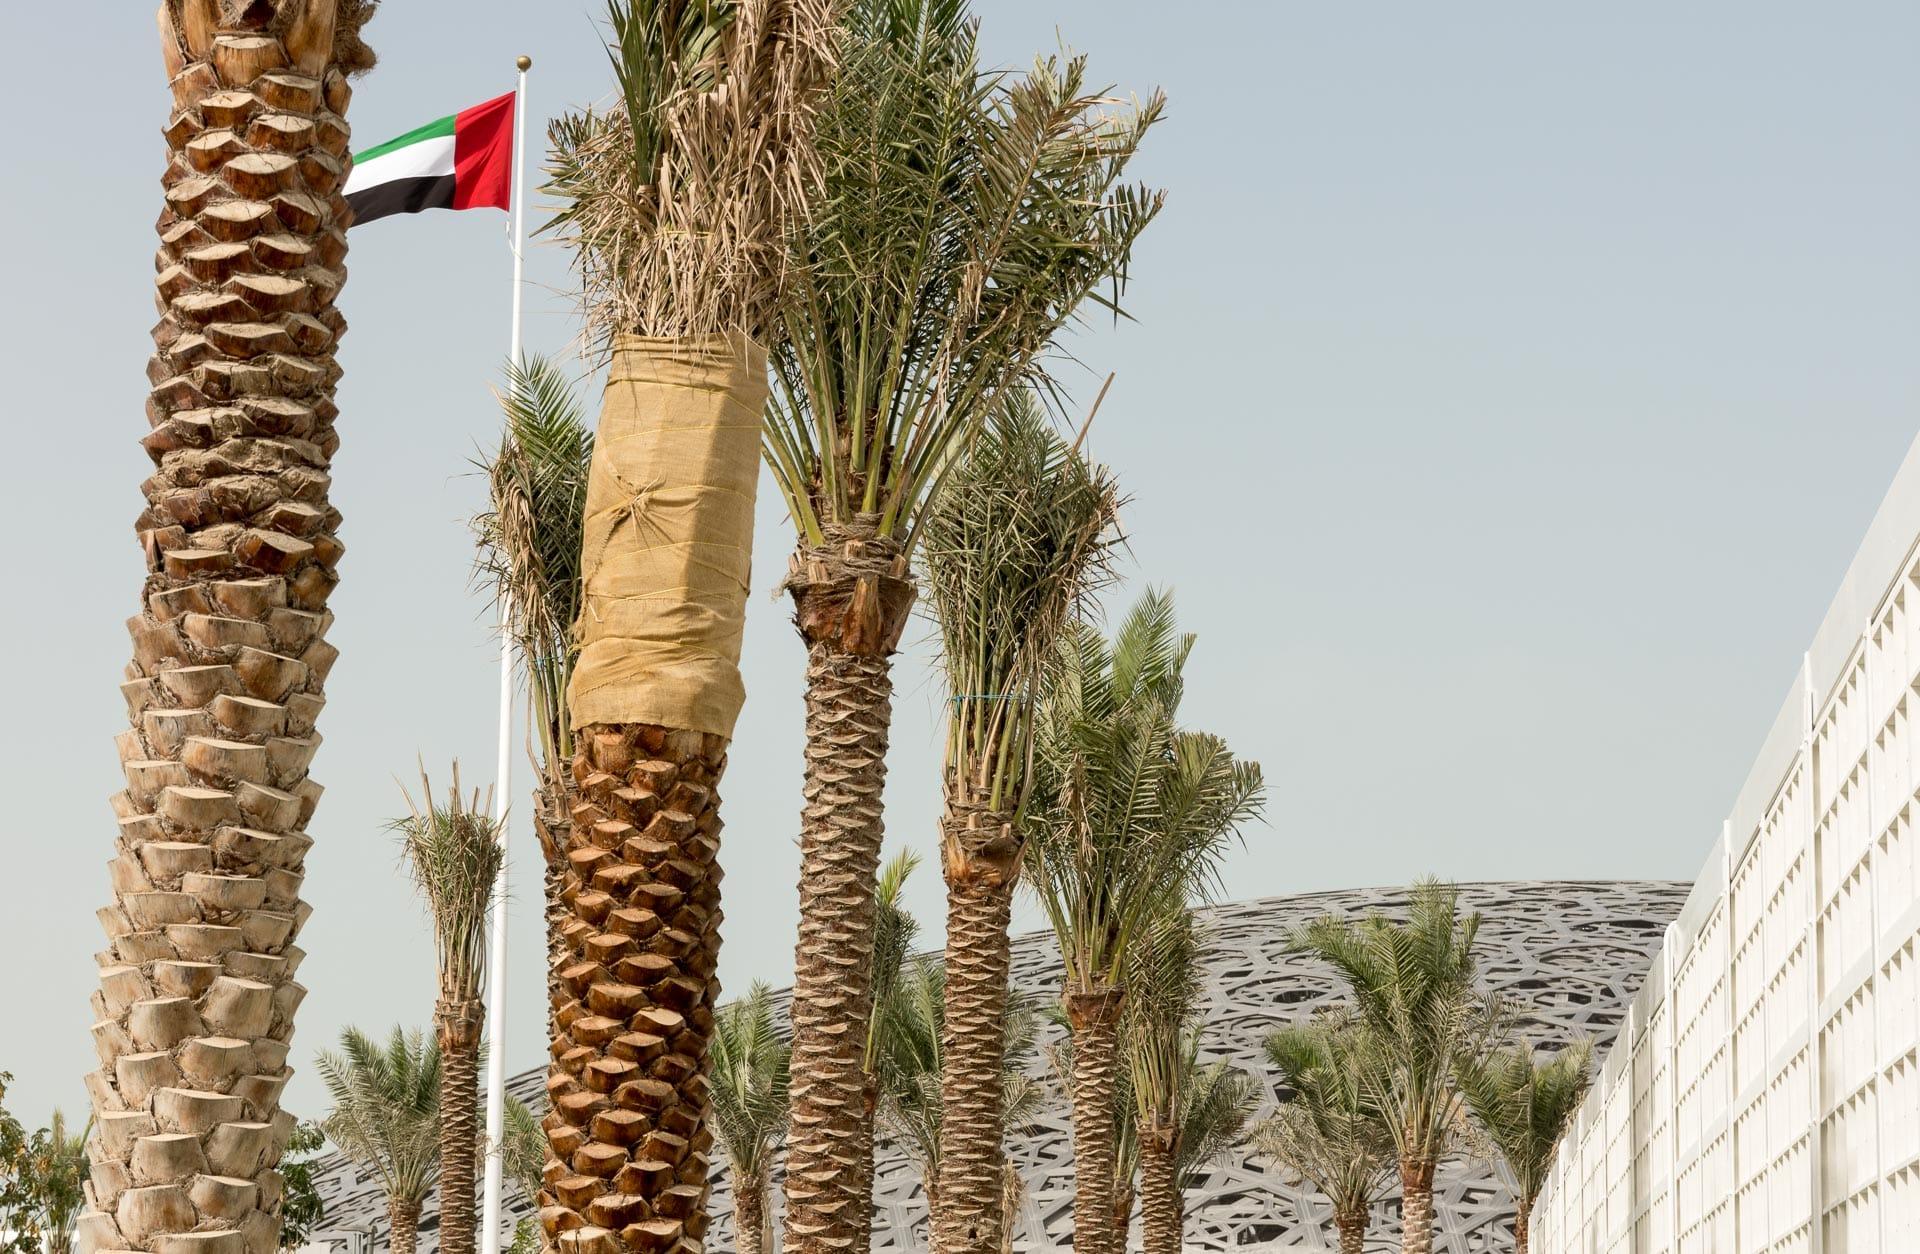 Muzeum Luwr, Abu Dhabi